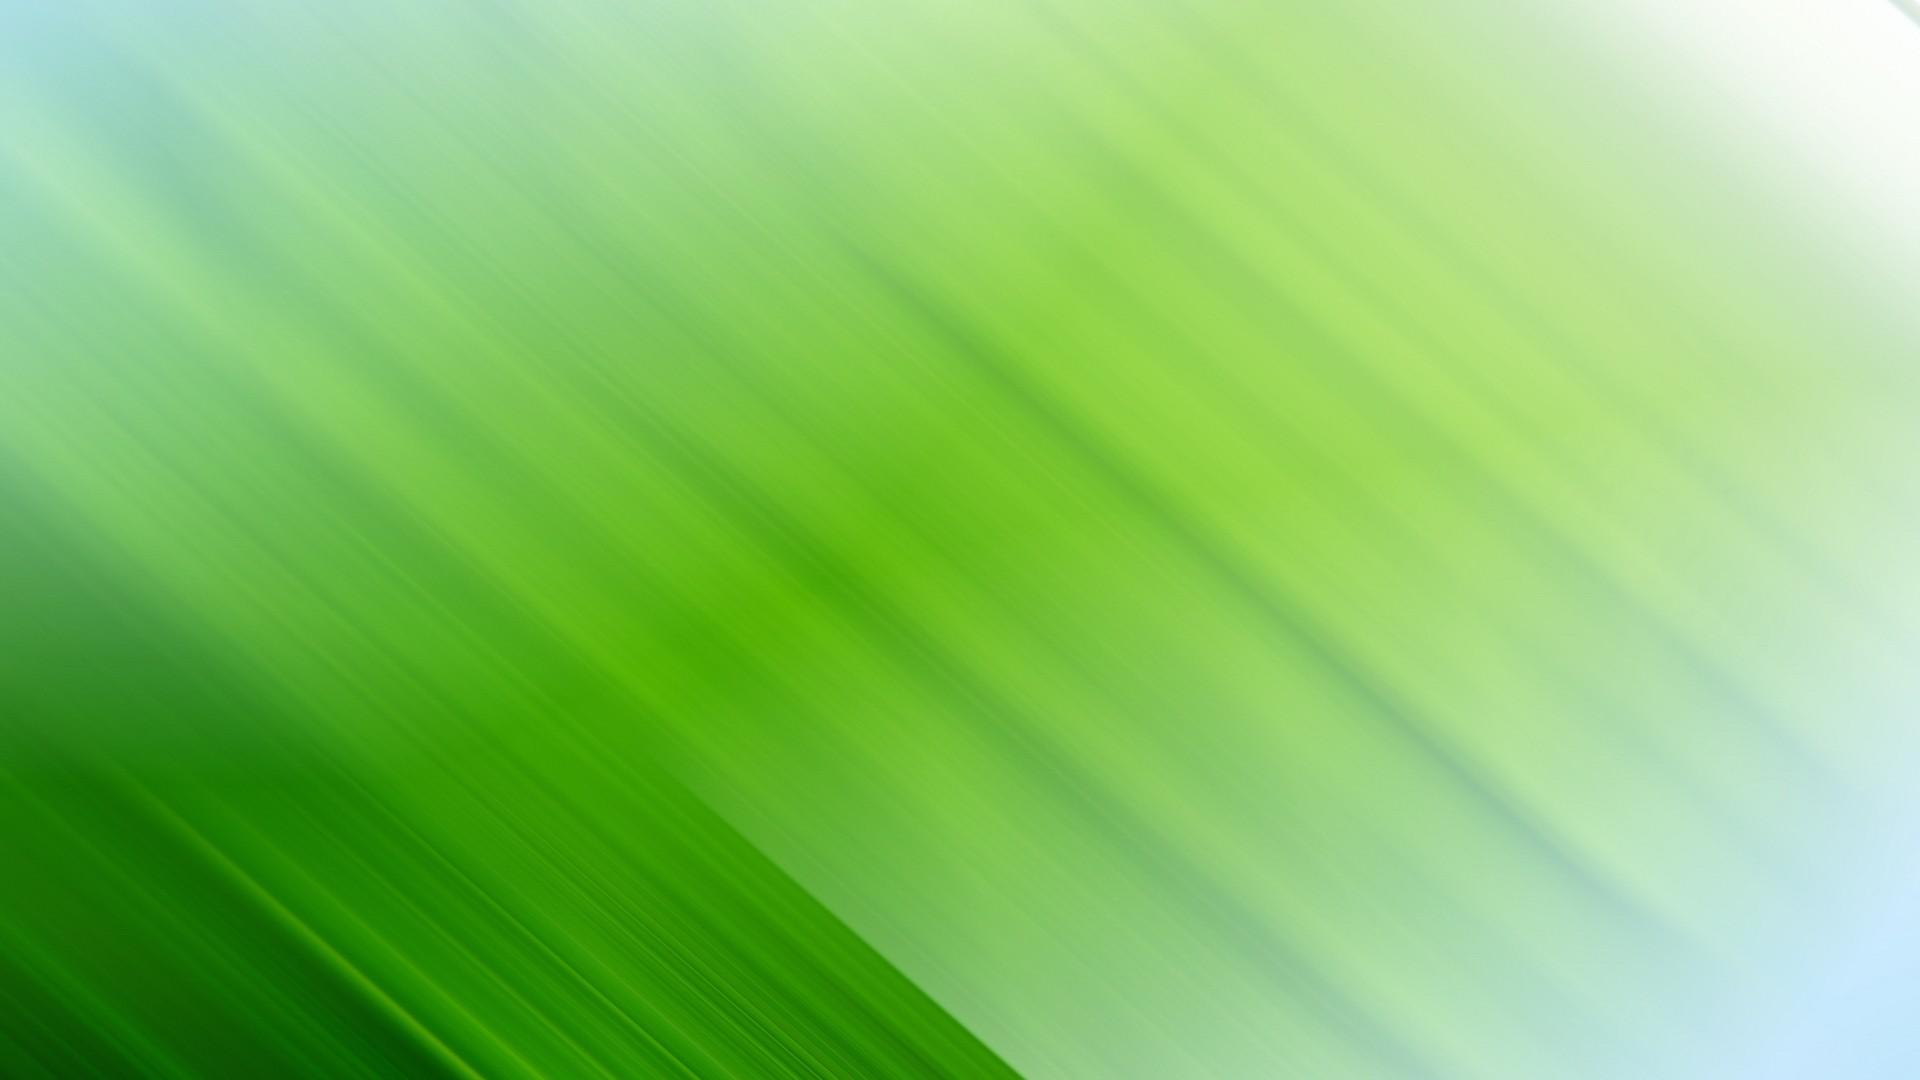 green abstract wallpaper 27601